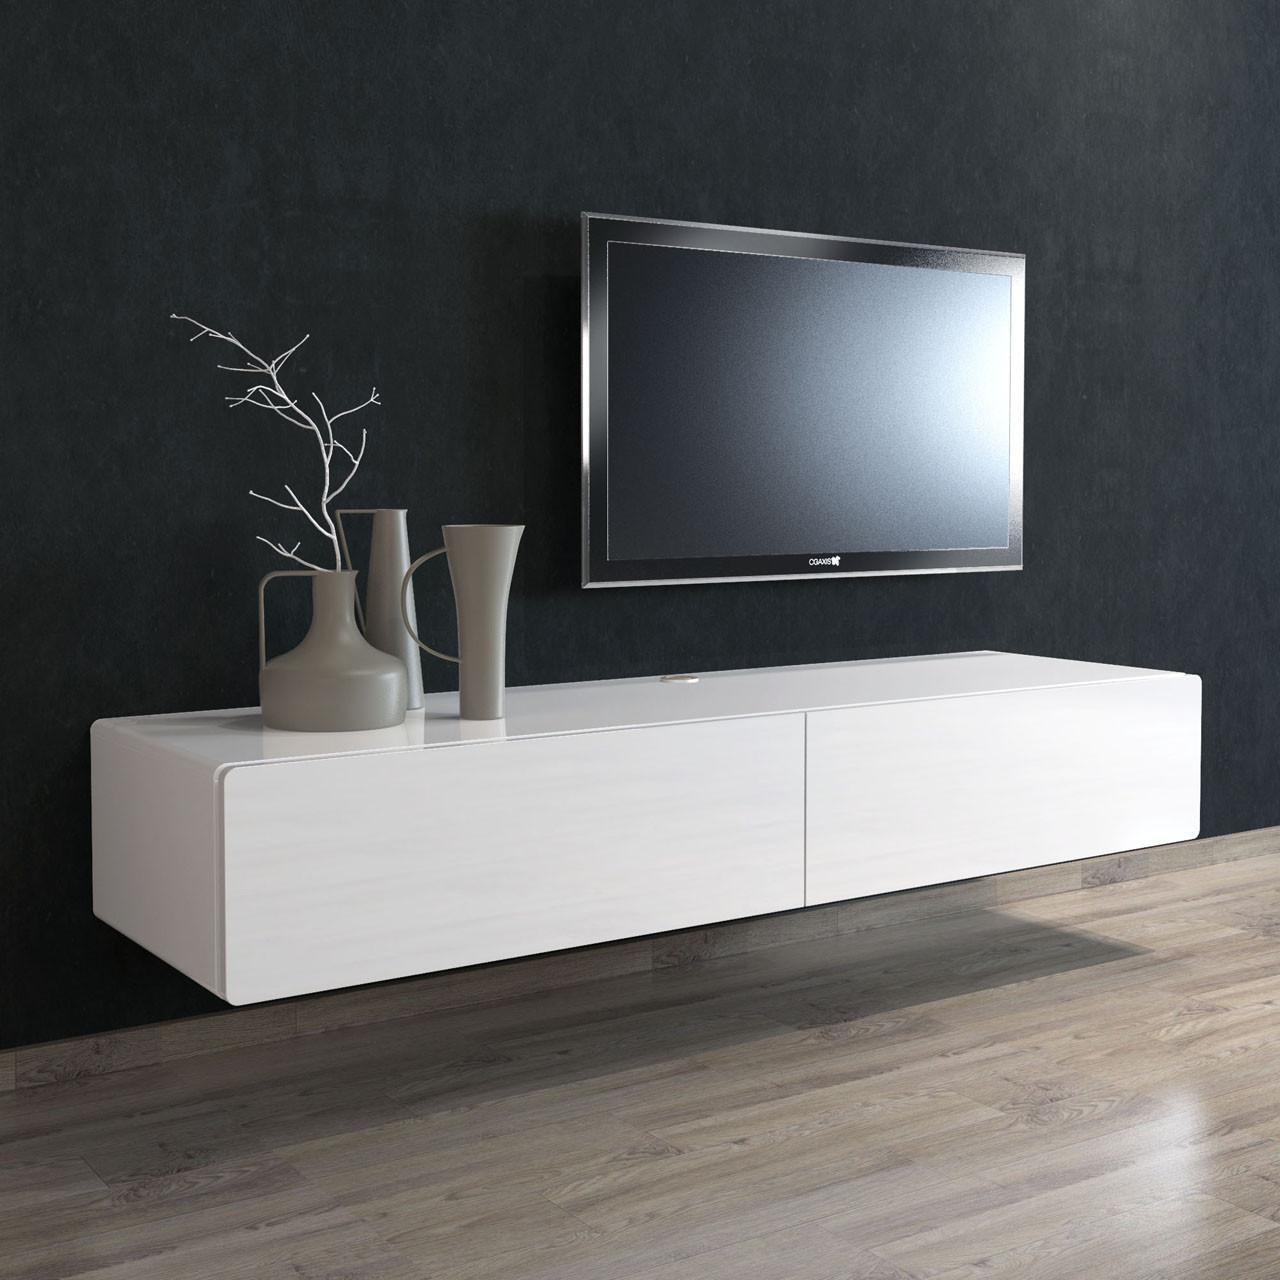 Brando Floating Entertainment Unit 166cm Cityside Furniture